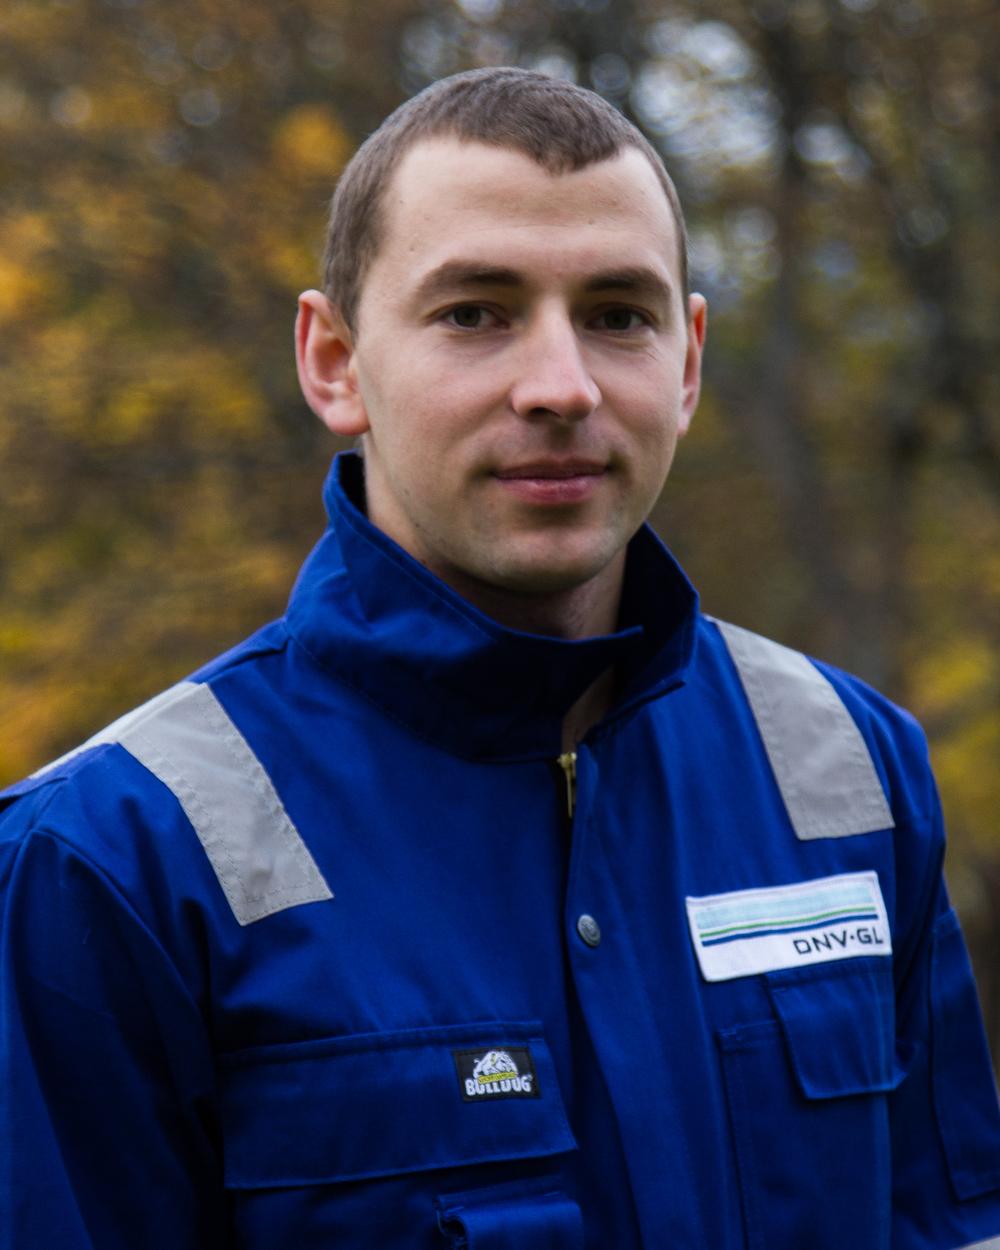 Milan Pesic – Motor Controller Studies: Power Engineering Campus: NTNU Gløshaugen Hometown: Nis, Serbia